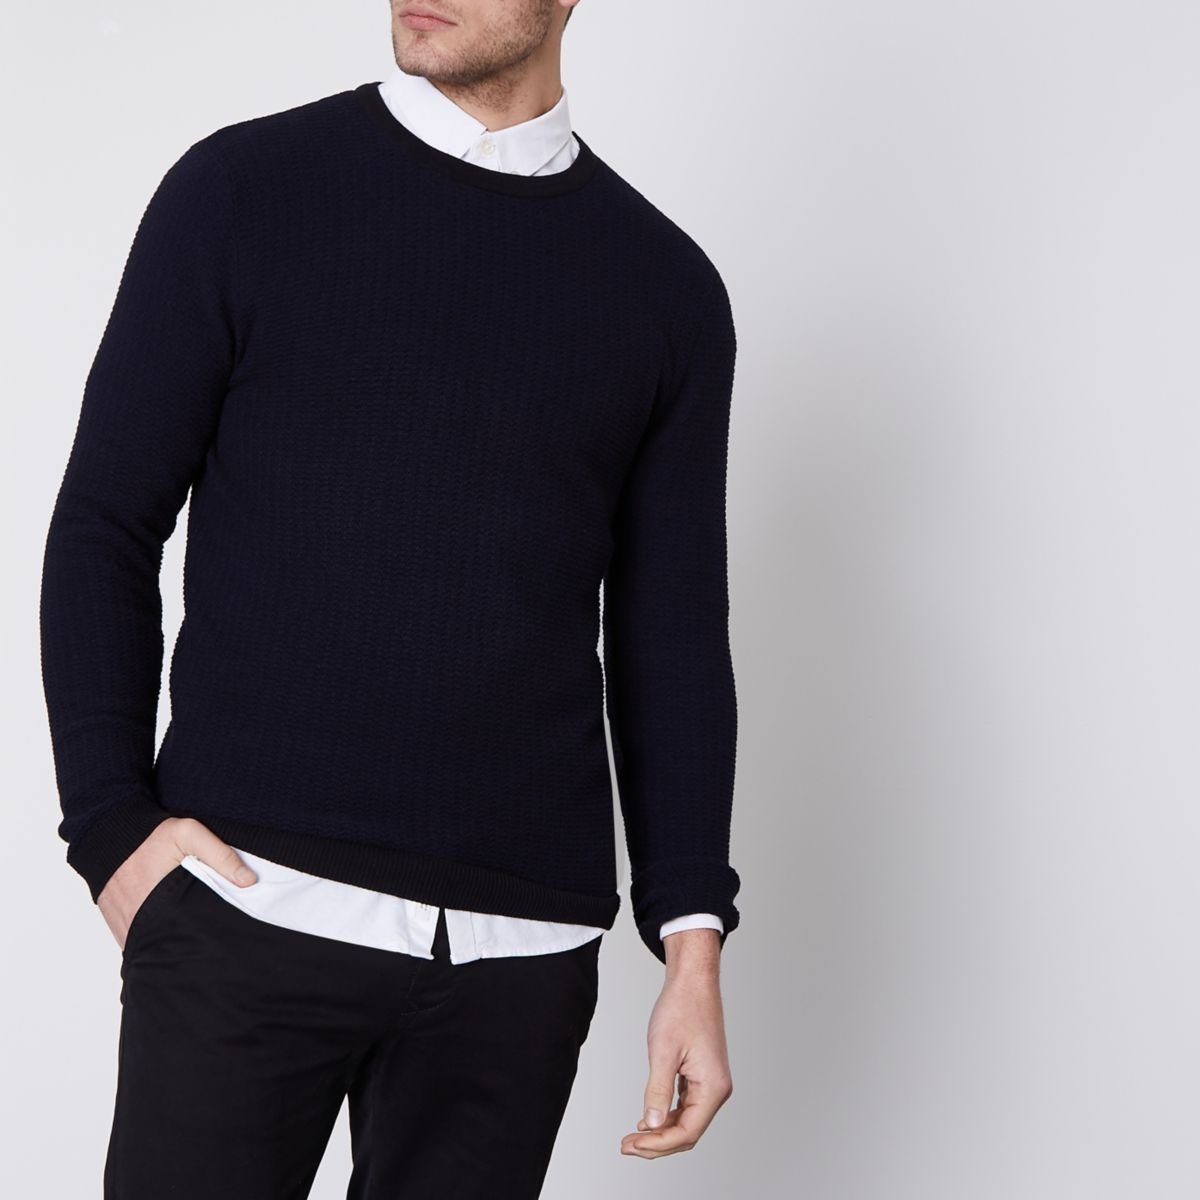 Navy Jack & Jones Premium waffle knit jumper